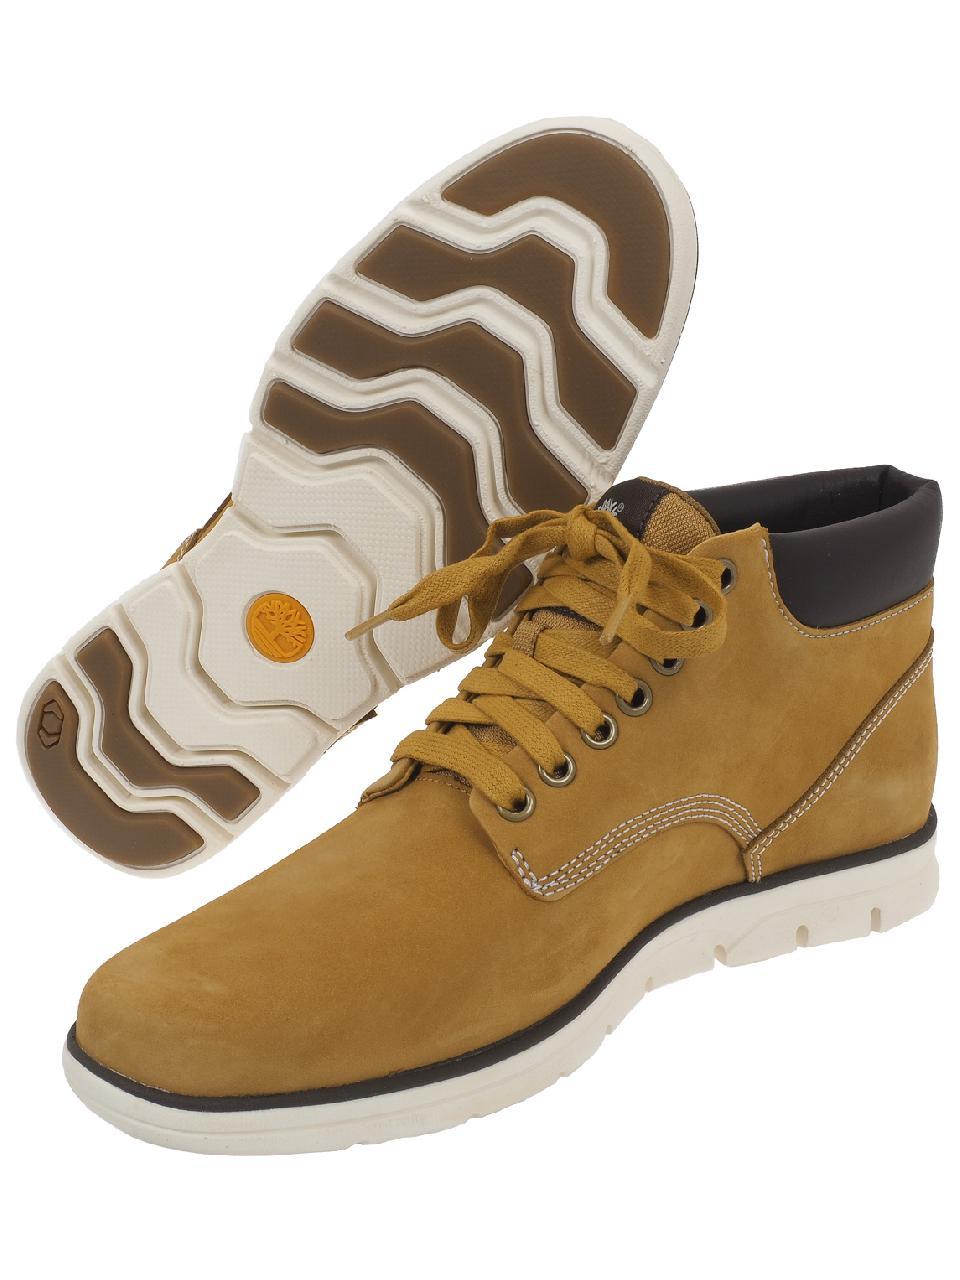 Détails sur Chaussures mid mi montantes Timberland Chukka leather wheat Marron 58371 Neuf